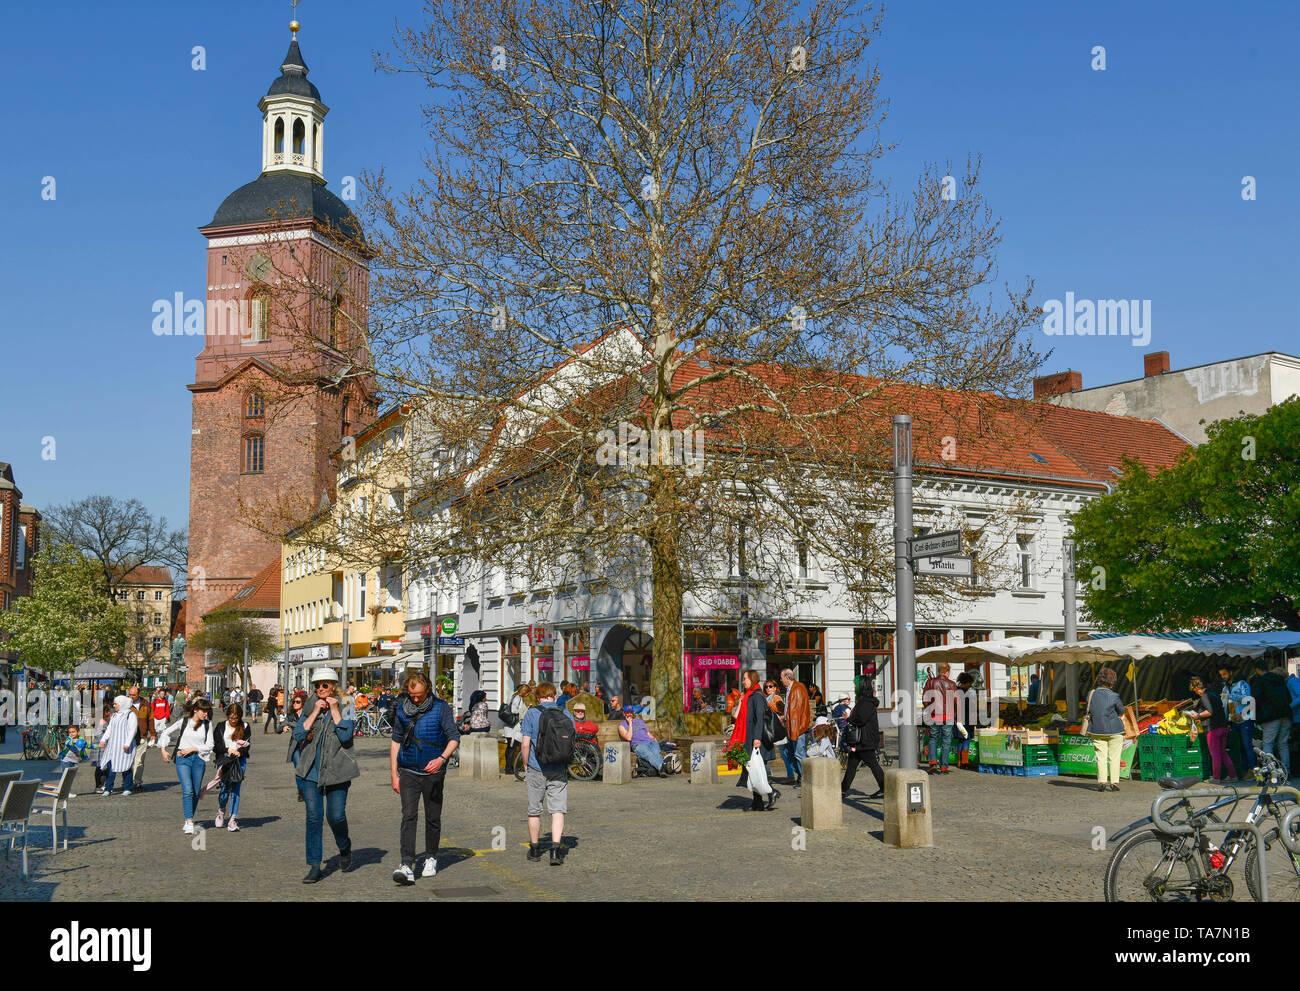 Pelican crossing, Einkaufstrasse, Carl apron street, Old Town, Spandau, Berlin, Germany, Fußgängerzone, Einkaufstraße, Carl-Schurz-Straße, Altstadt, D - Stock Image